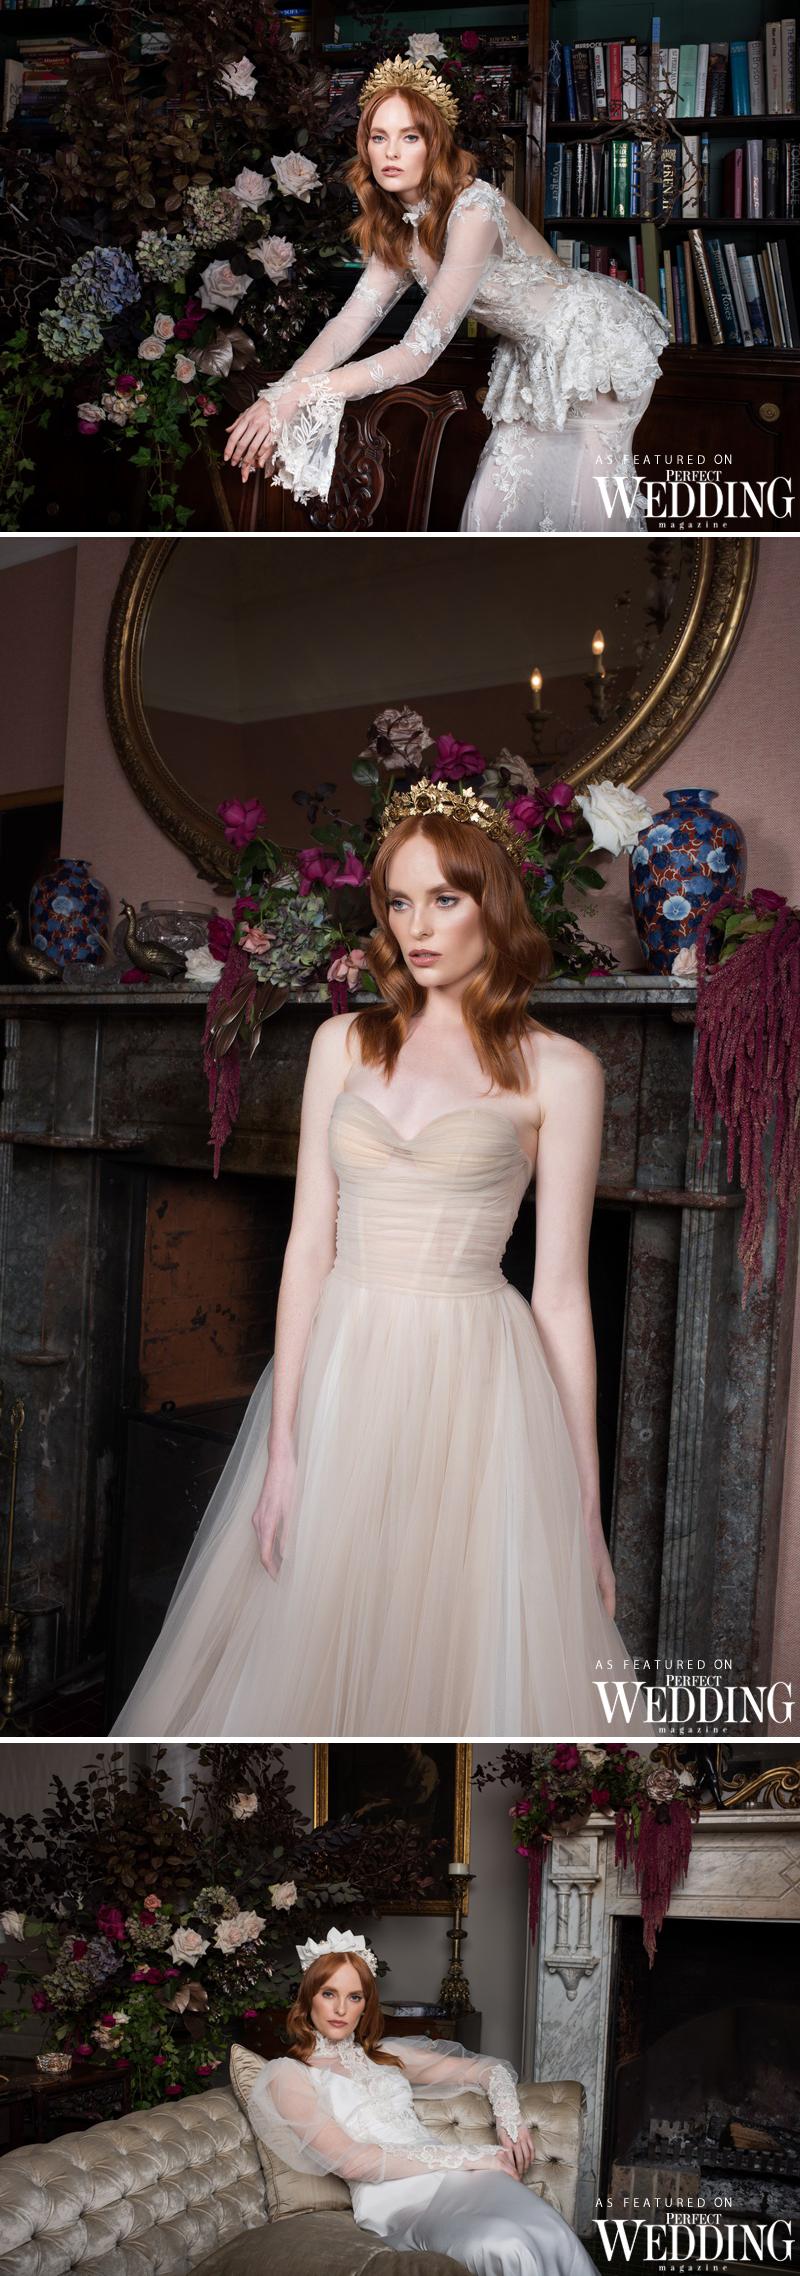 Viktoria Novak, Viktoria Novak Immortal Renaissance, Bridal Milliner, Perfect Wedding Magazine, Perfect Wedding Blog